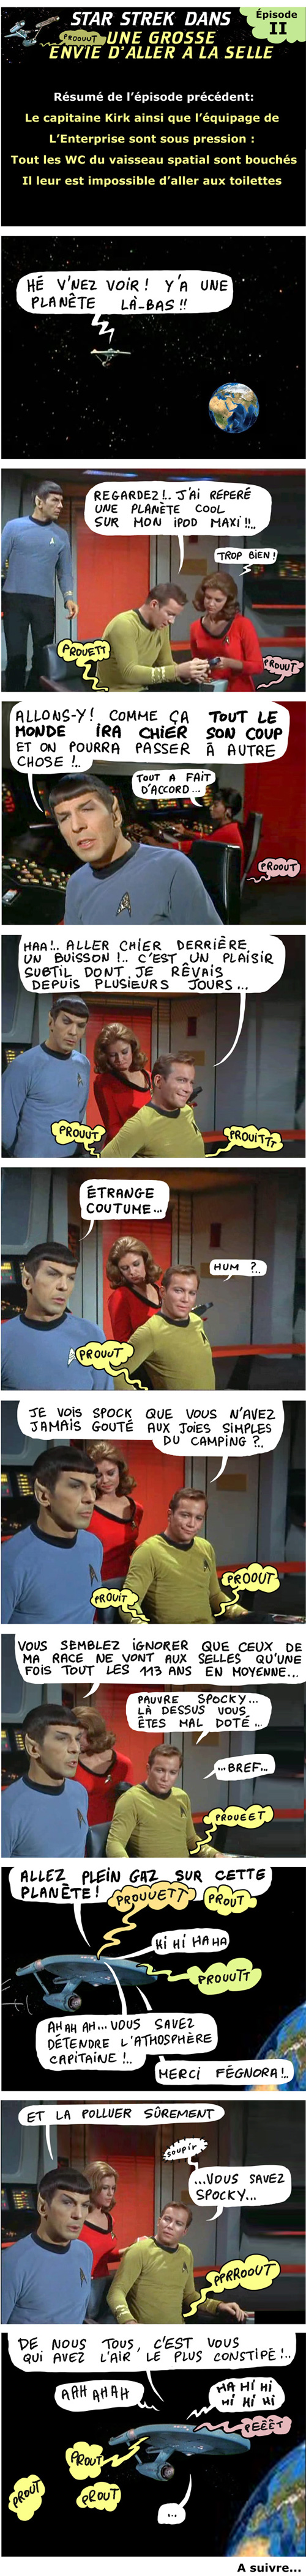 star treck - capitaine kirk fait caca 2